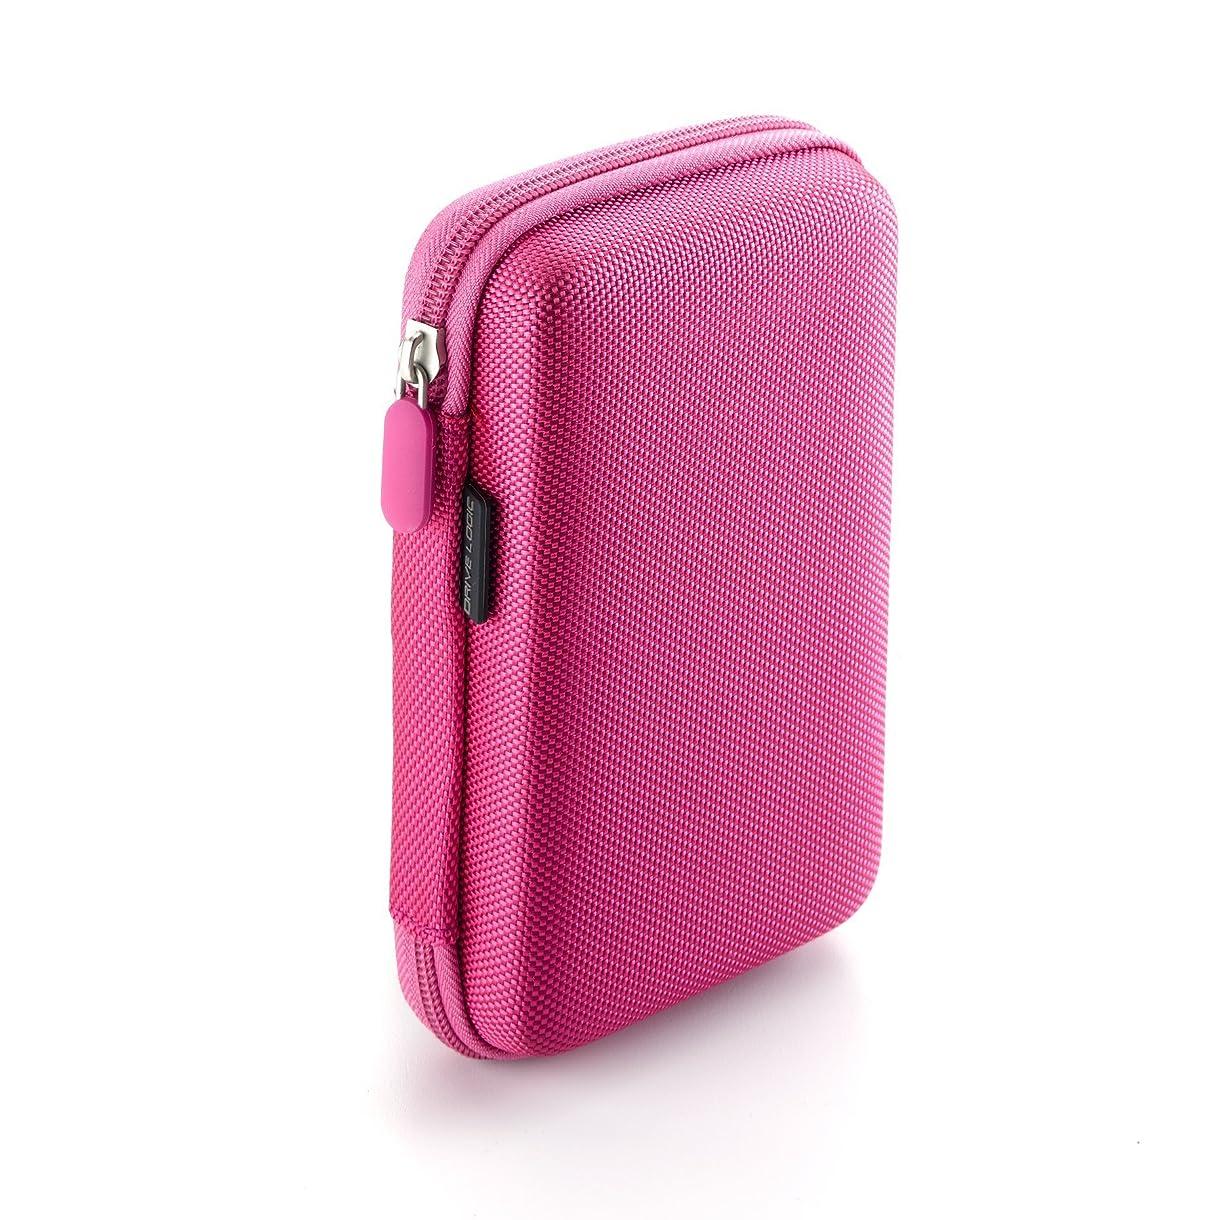 順番絶妙奴隷Drive Logic DL-64 Portable EVA Hard Drive Carrying Case Pouch